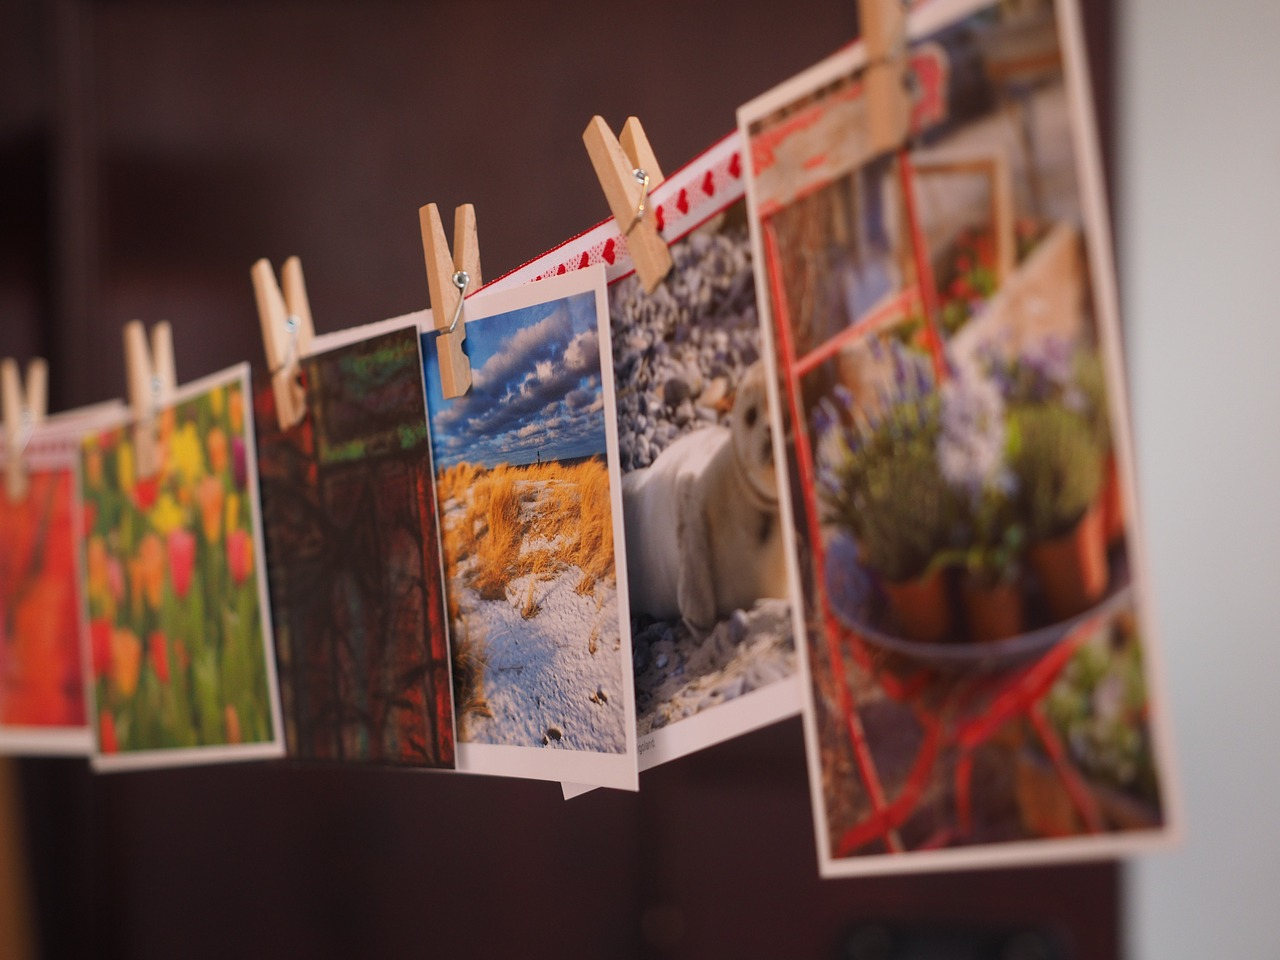 postcards-1174179_1280